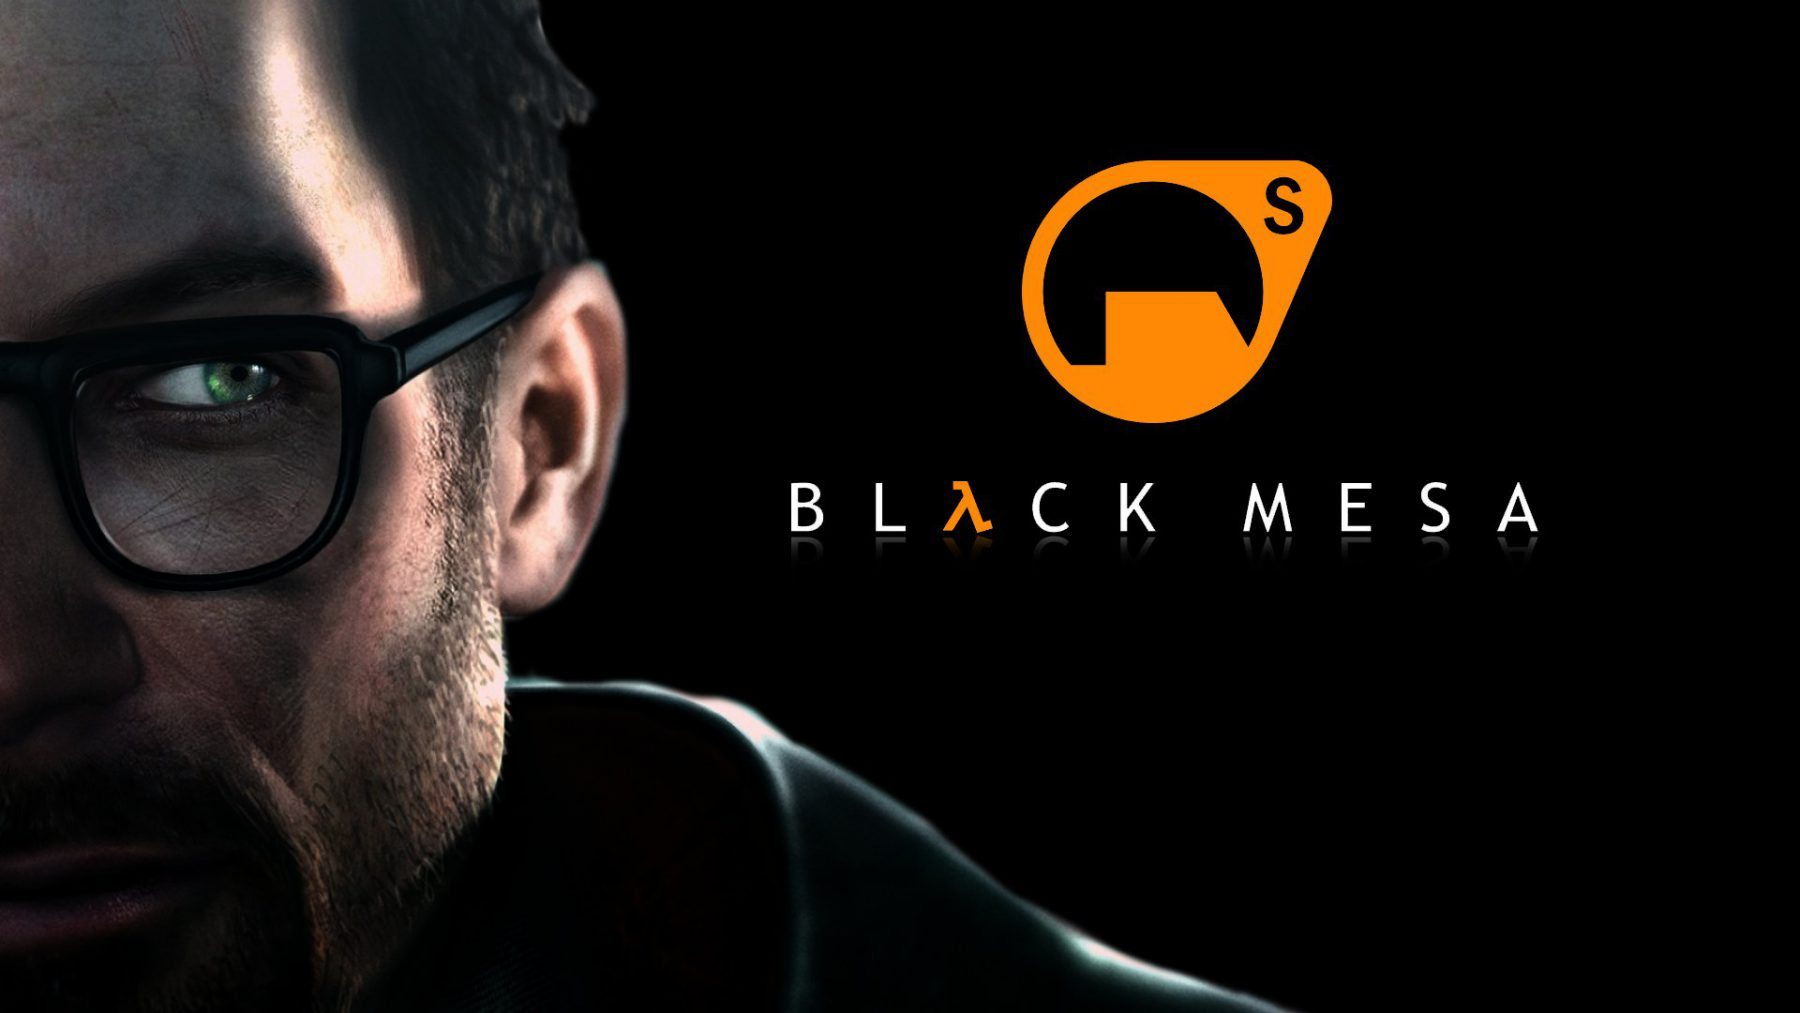 black_mesa_wallpaper_1920x1080-game0-img225506